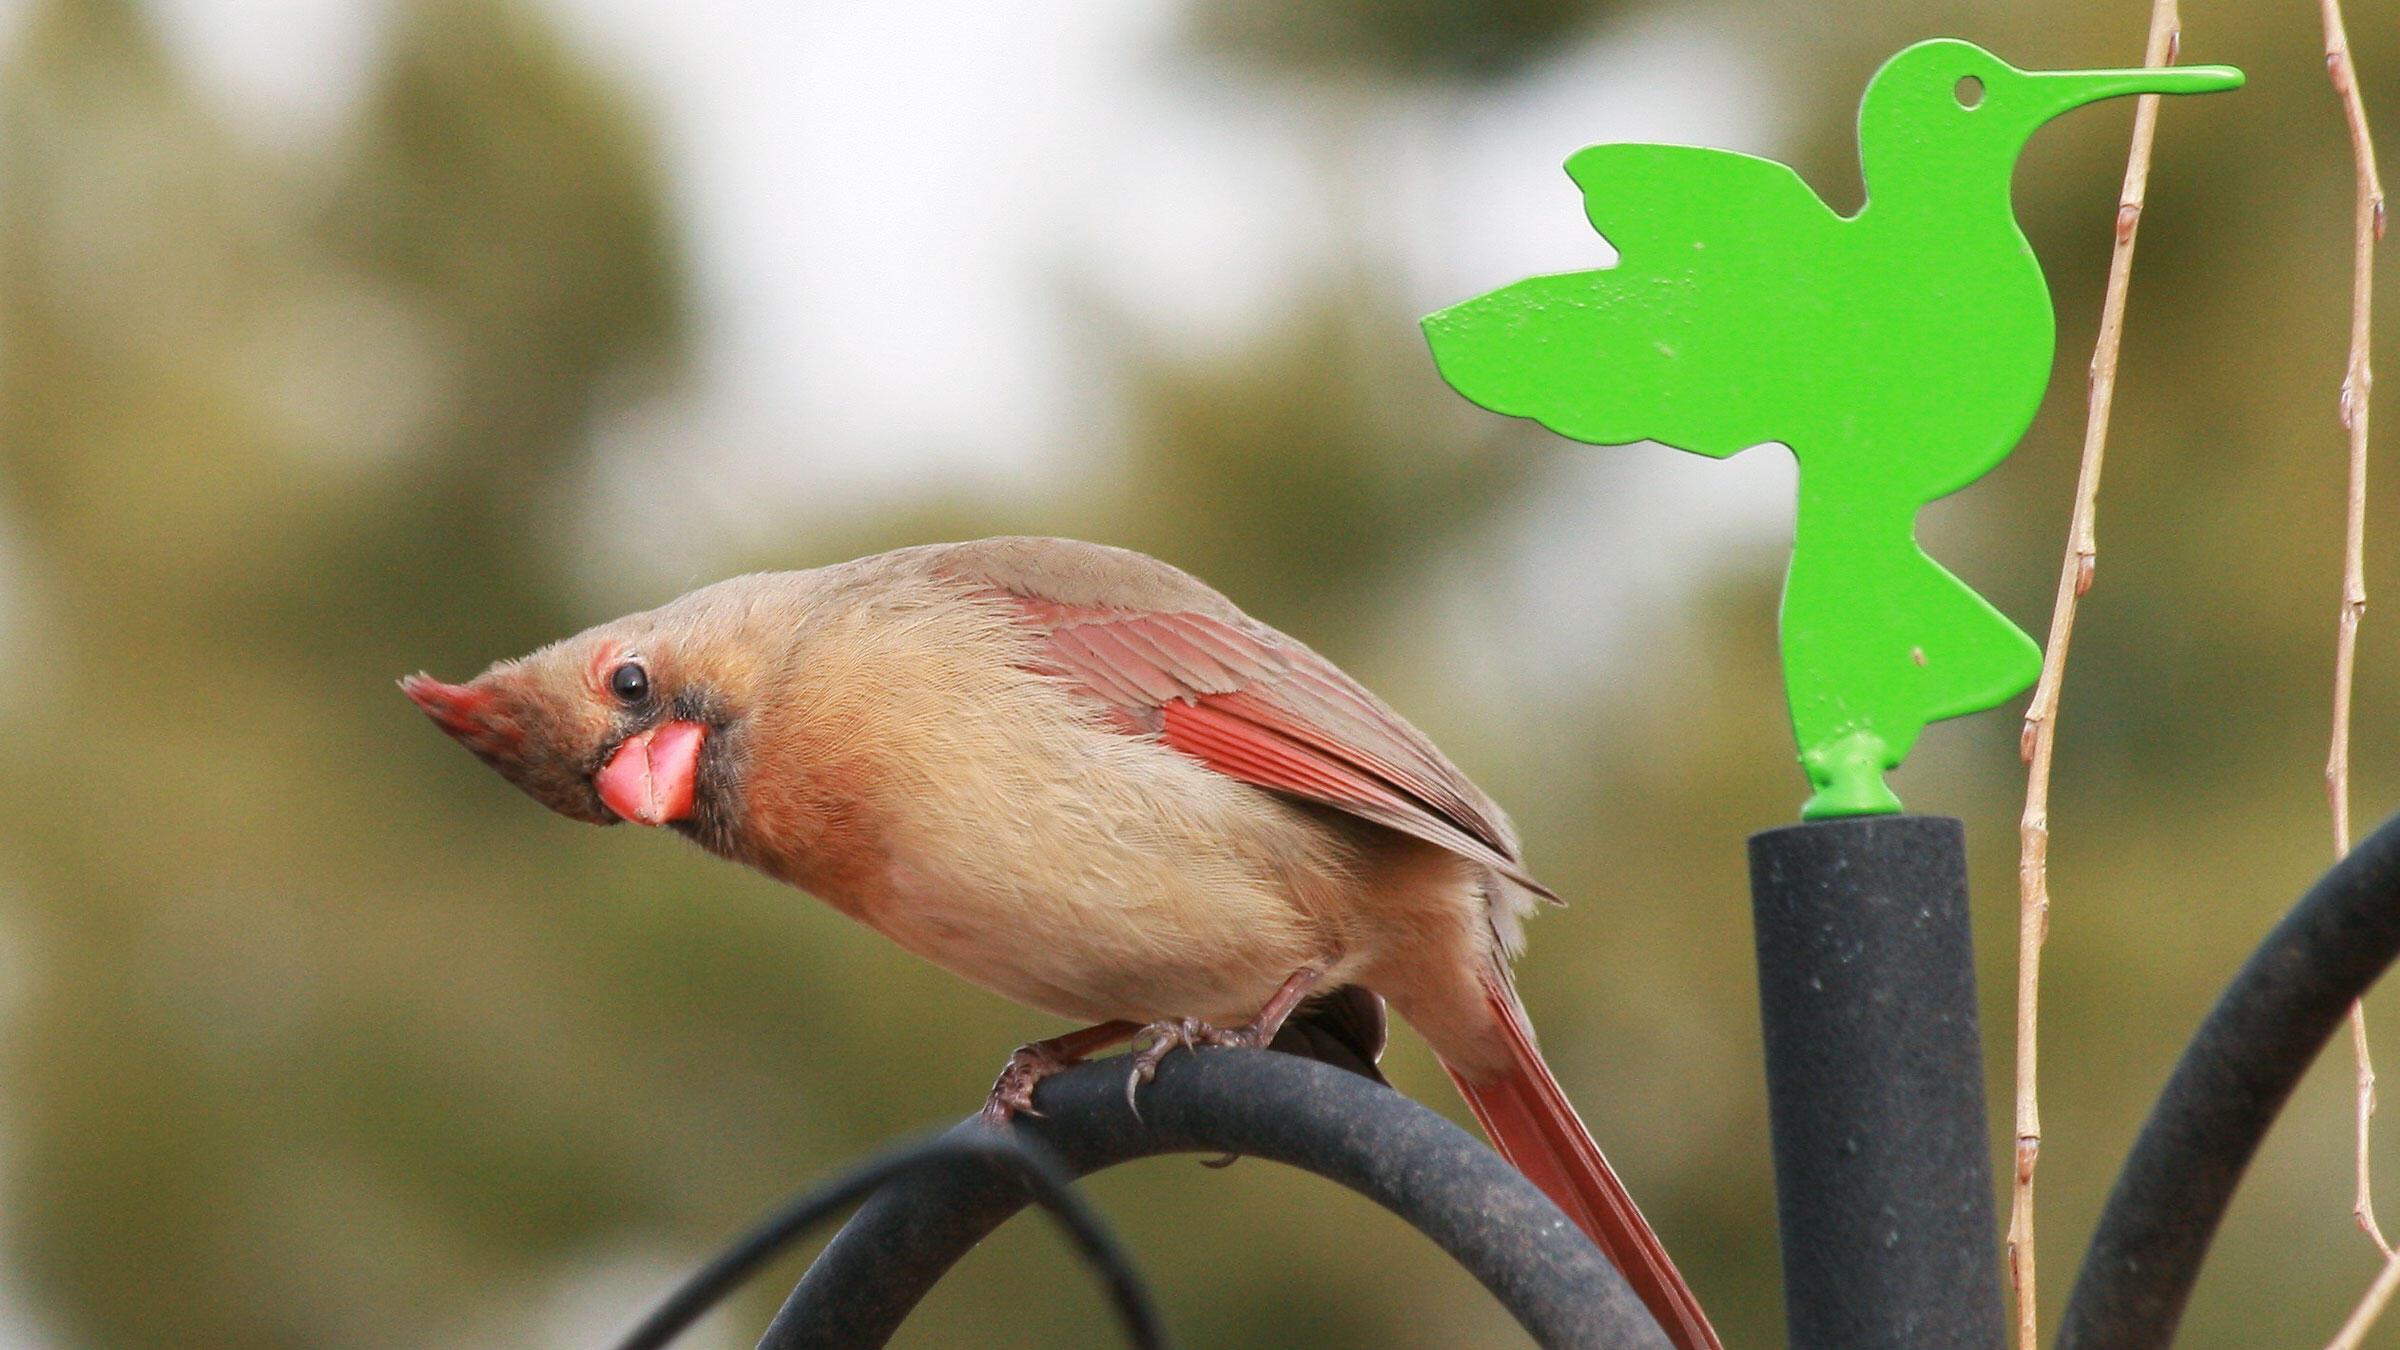 Lesley Val Adams/Great Backyard Bird Count Participant. Northern Cardinal. Lesley Val Adams/Great Backyard Bird Count